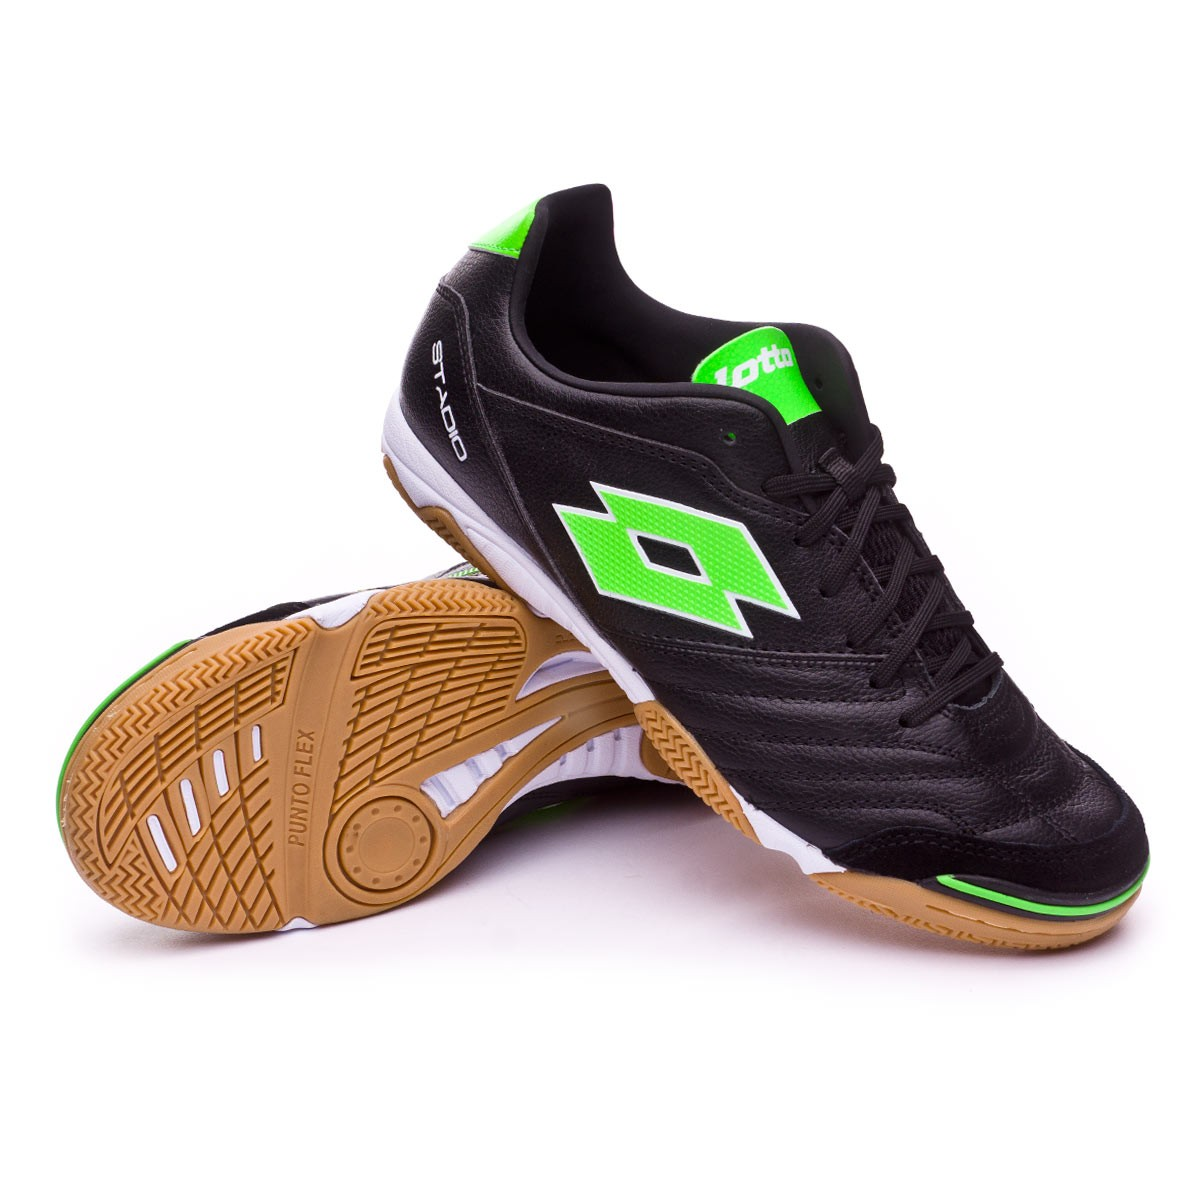 b21751e2e Futsal Boot Lotto Stadio 300 II ID Black-Mint - Football store Fútbol  Emotion